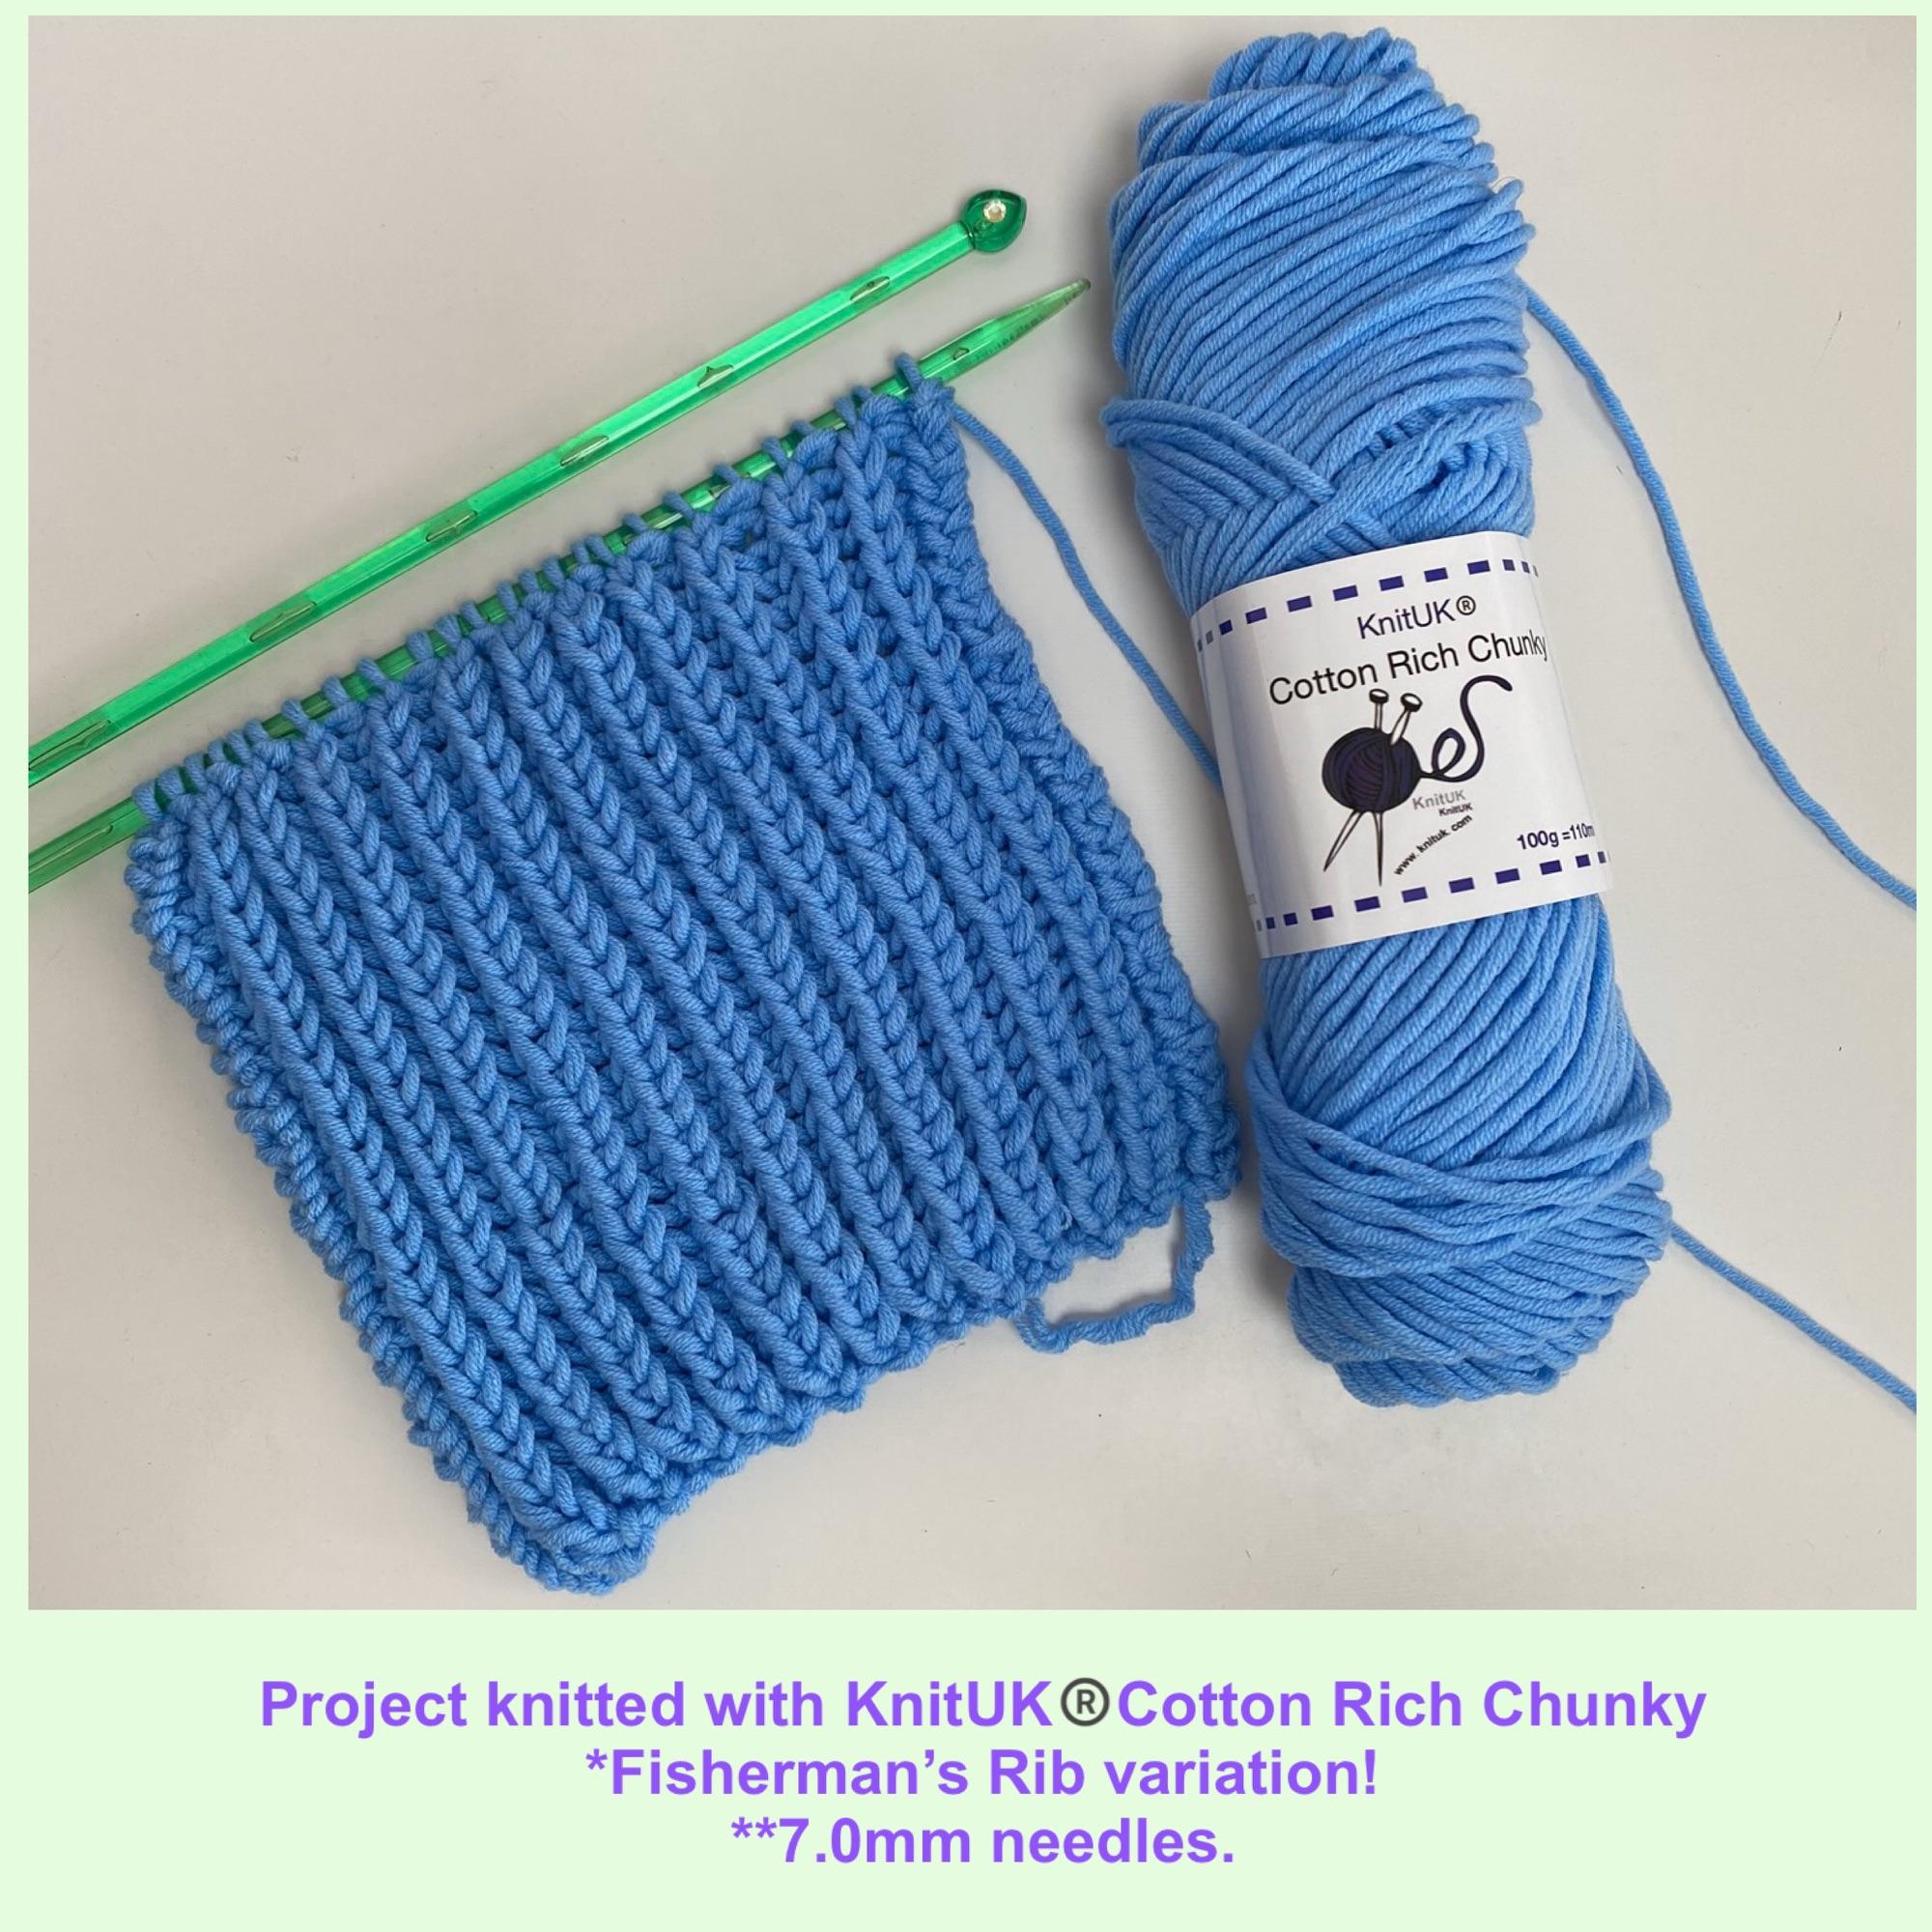 knituk cotton rich chunky yarn knitting fishermans rib in 7 mm needles